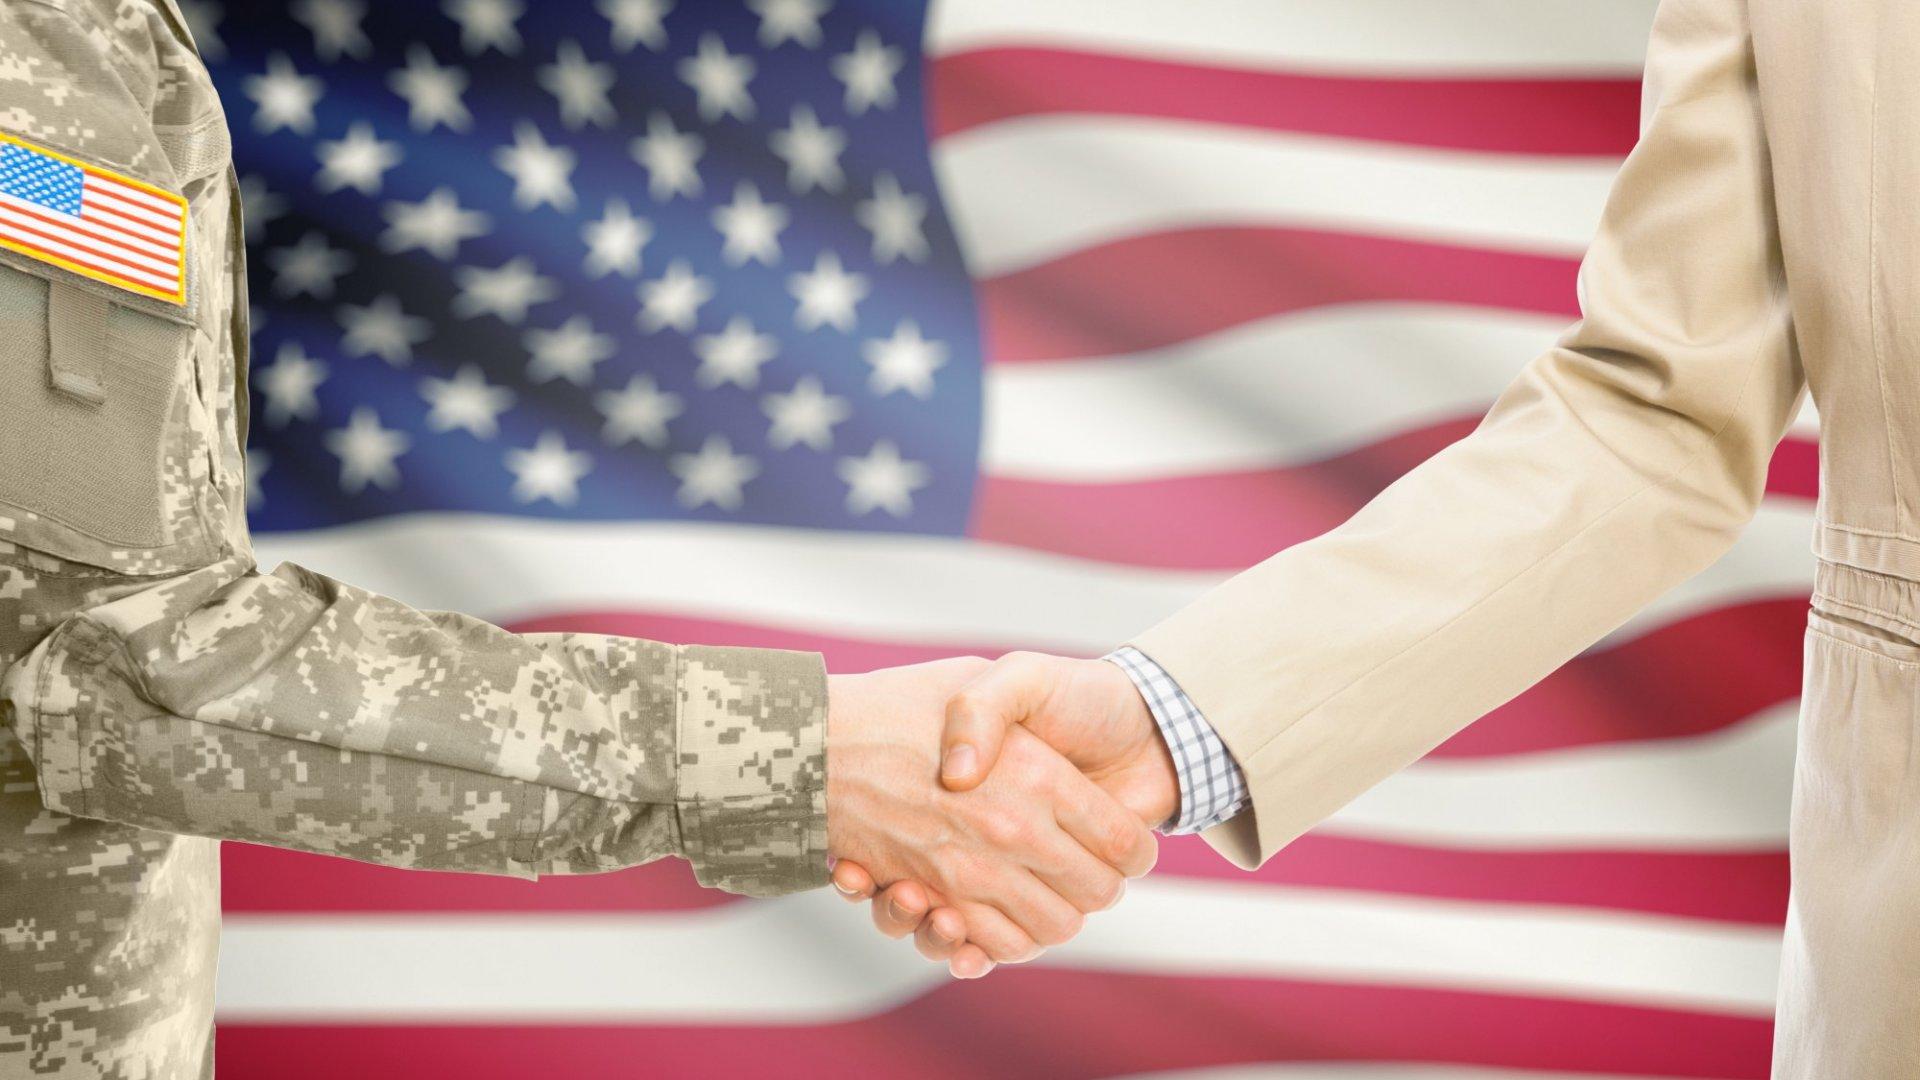 What Veterans Can Do to Pursue Entrepreneurship